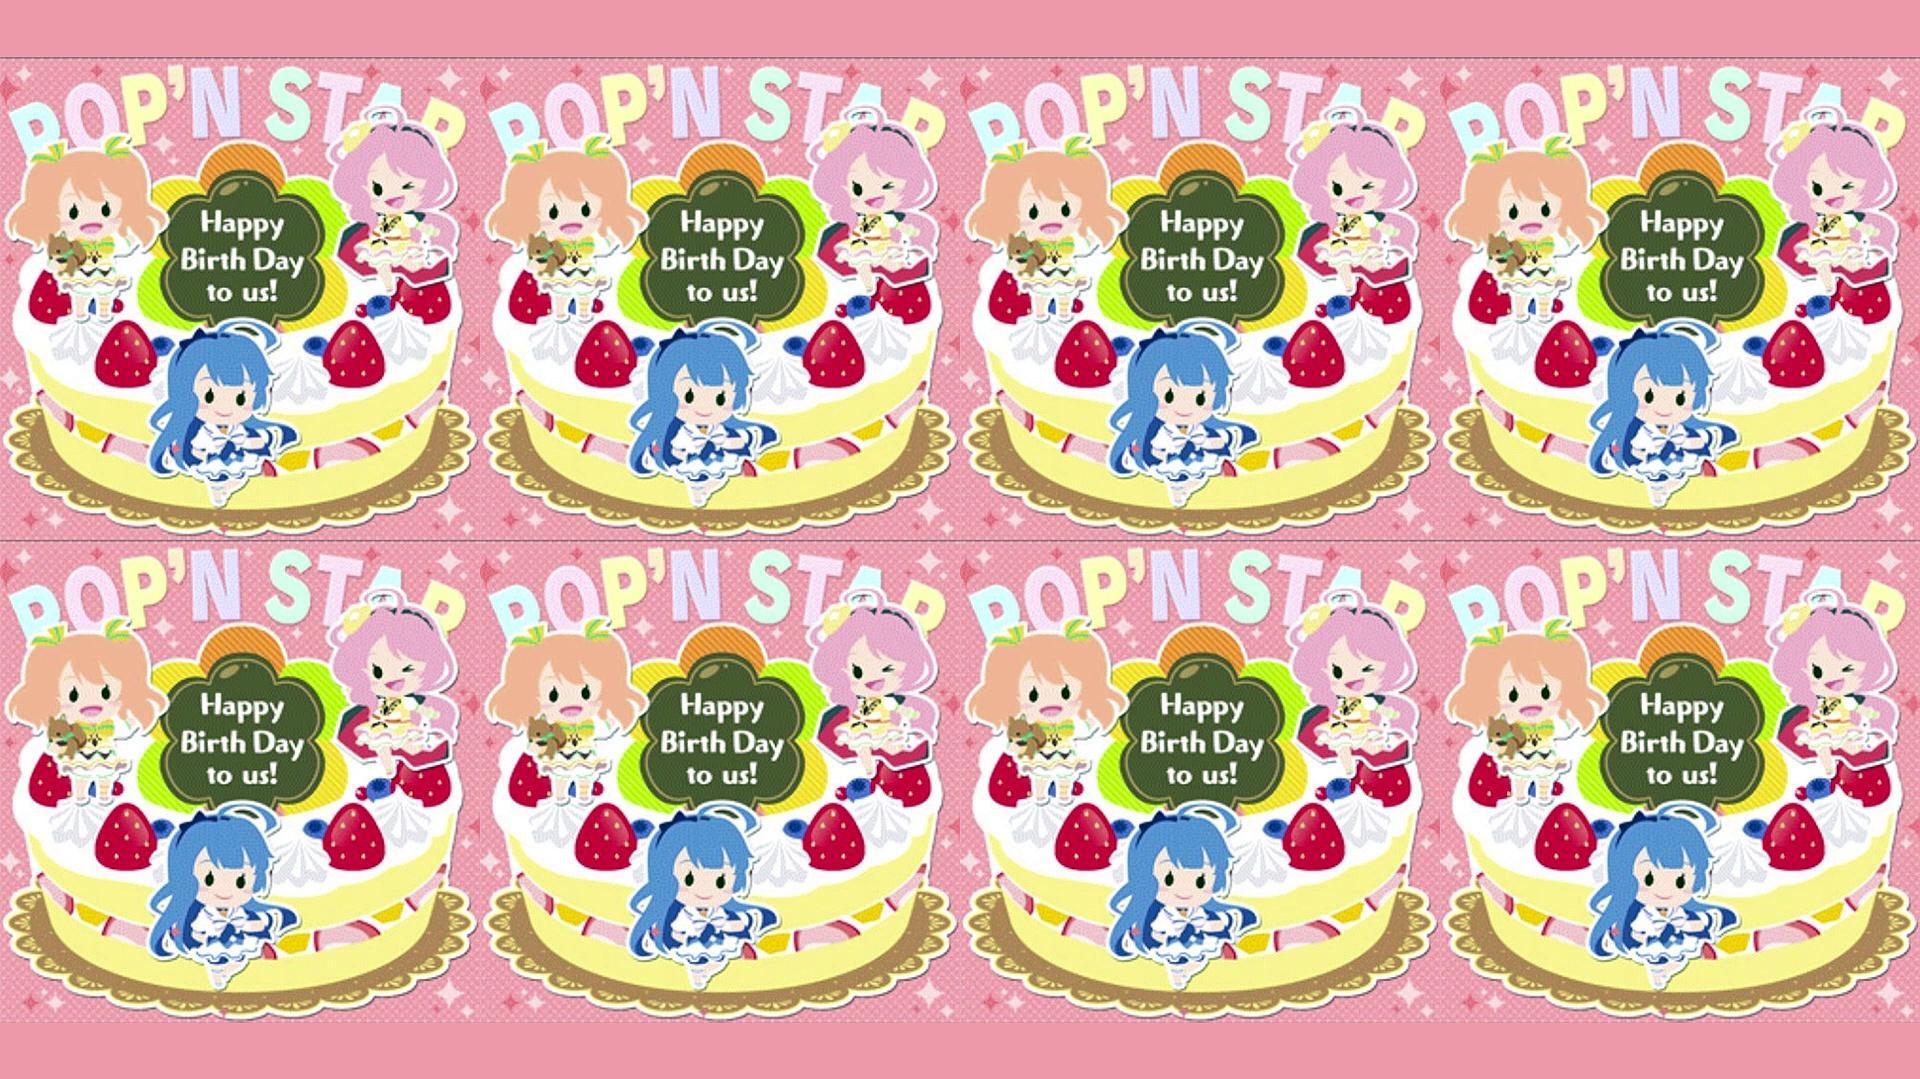 Happy Birth Day to us! - POP'N STAR